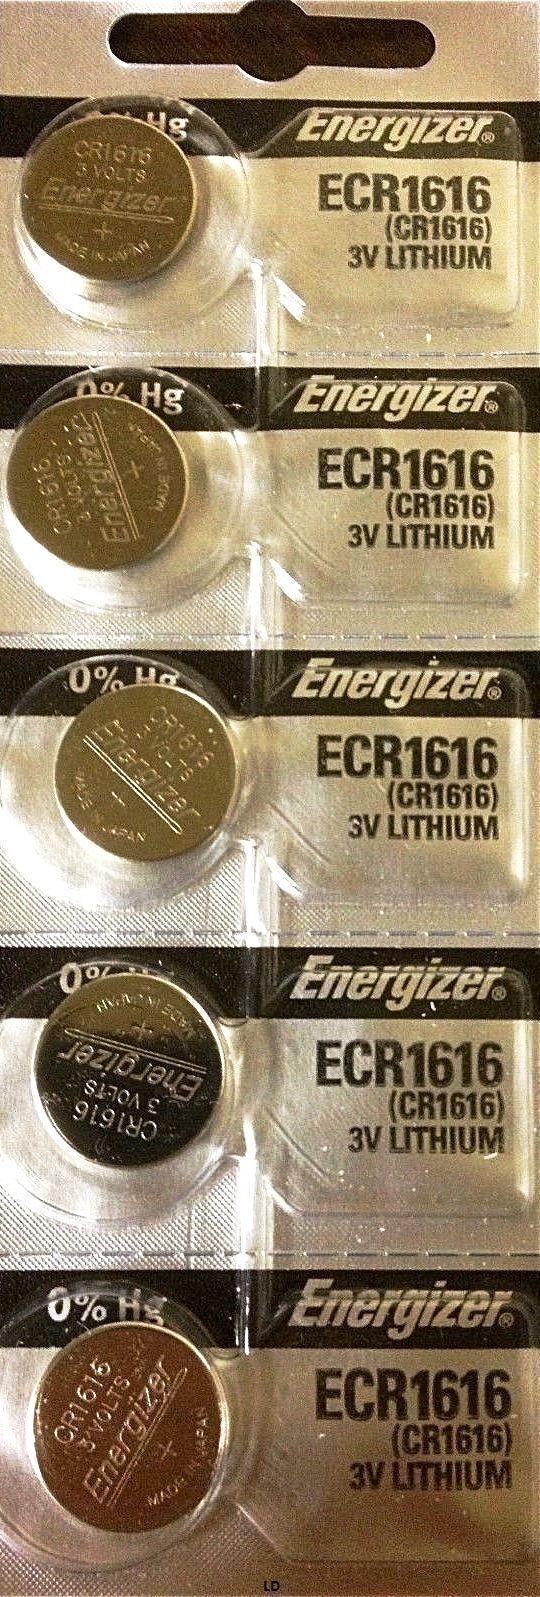 5 x Fresh ENERGIZER CR1616 BATTERY 3V LITHIUM CR 1616 DL1616 BR1616 EXP 2027 Consumer Electronics